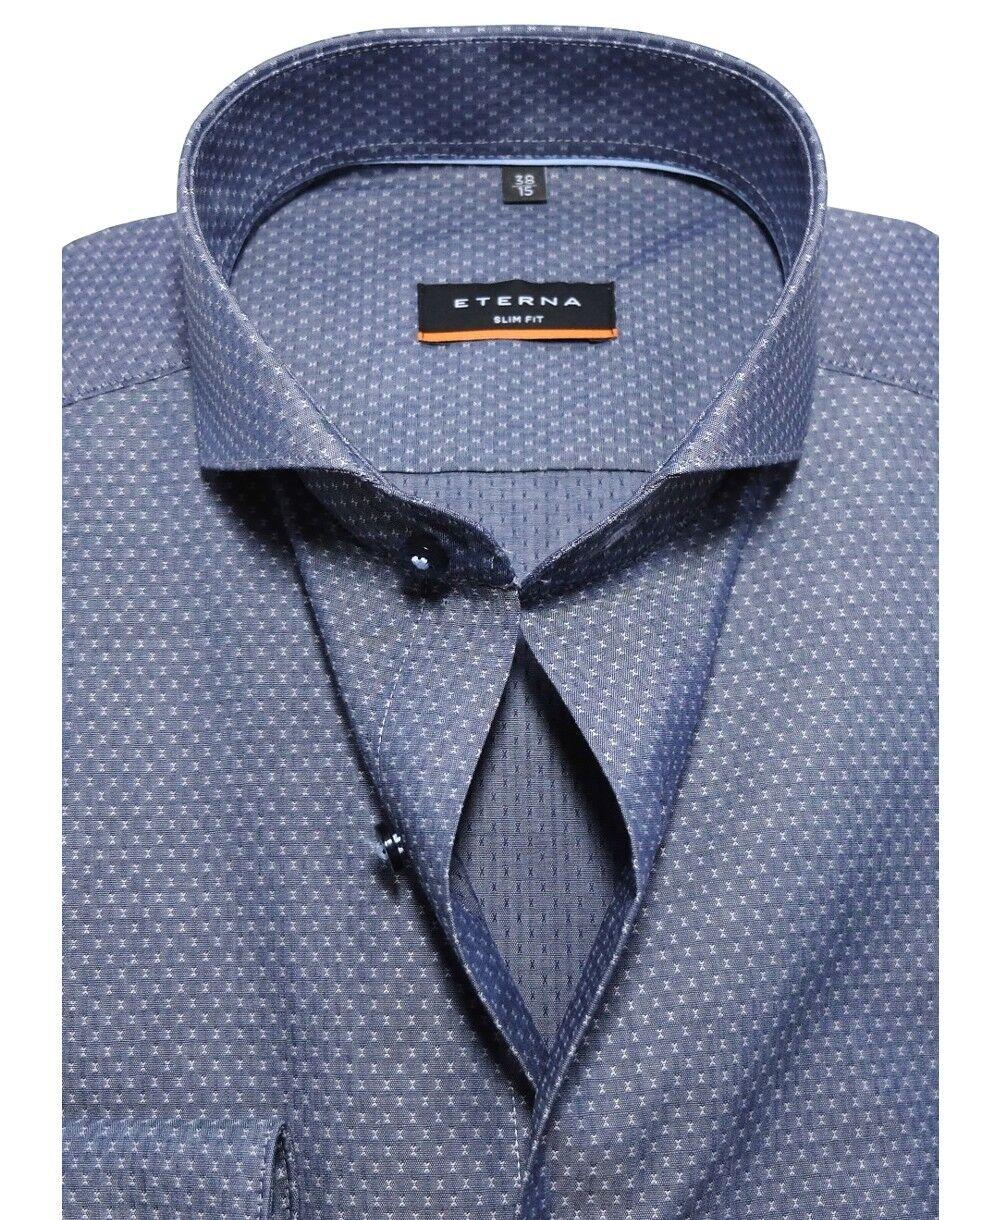 Eterna Slim Fit Langarmhemd Stretch blaugrau Minidessin ÄL ÄL ÄL 67cm Gr. 38 bis 44 | Ausgezeichnetes Preis  300a42